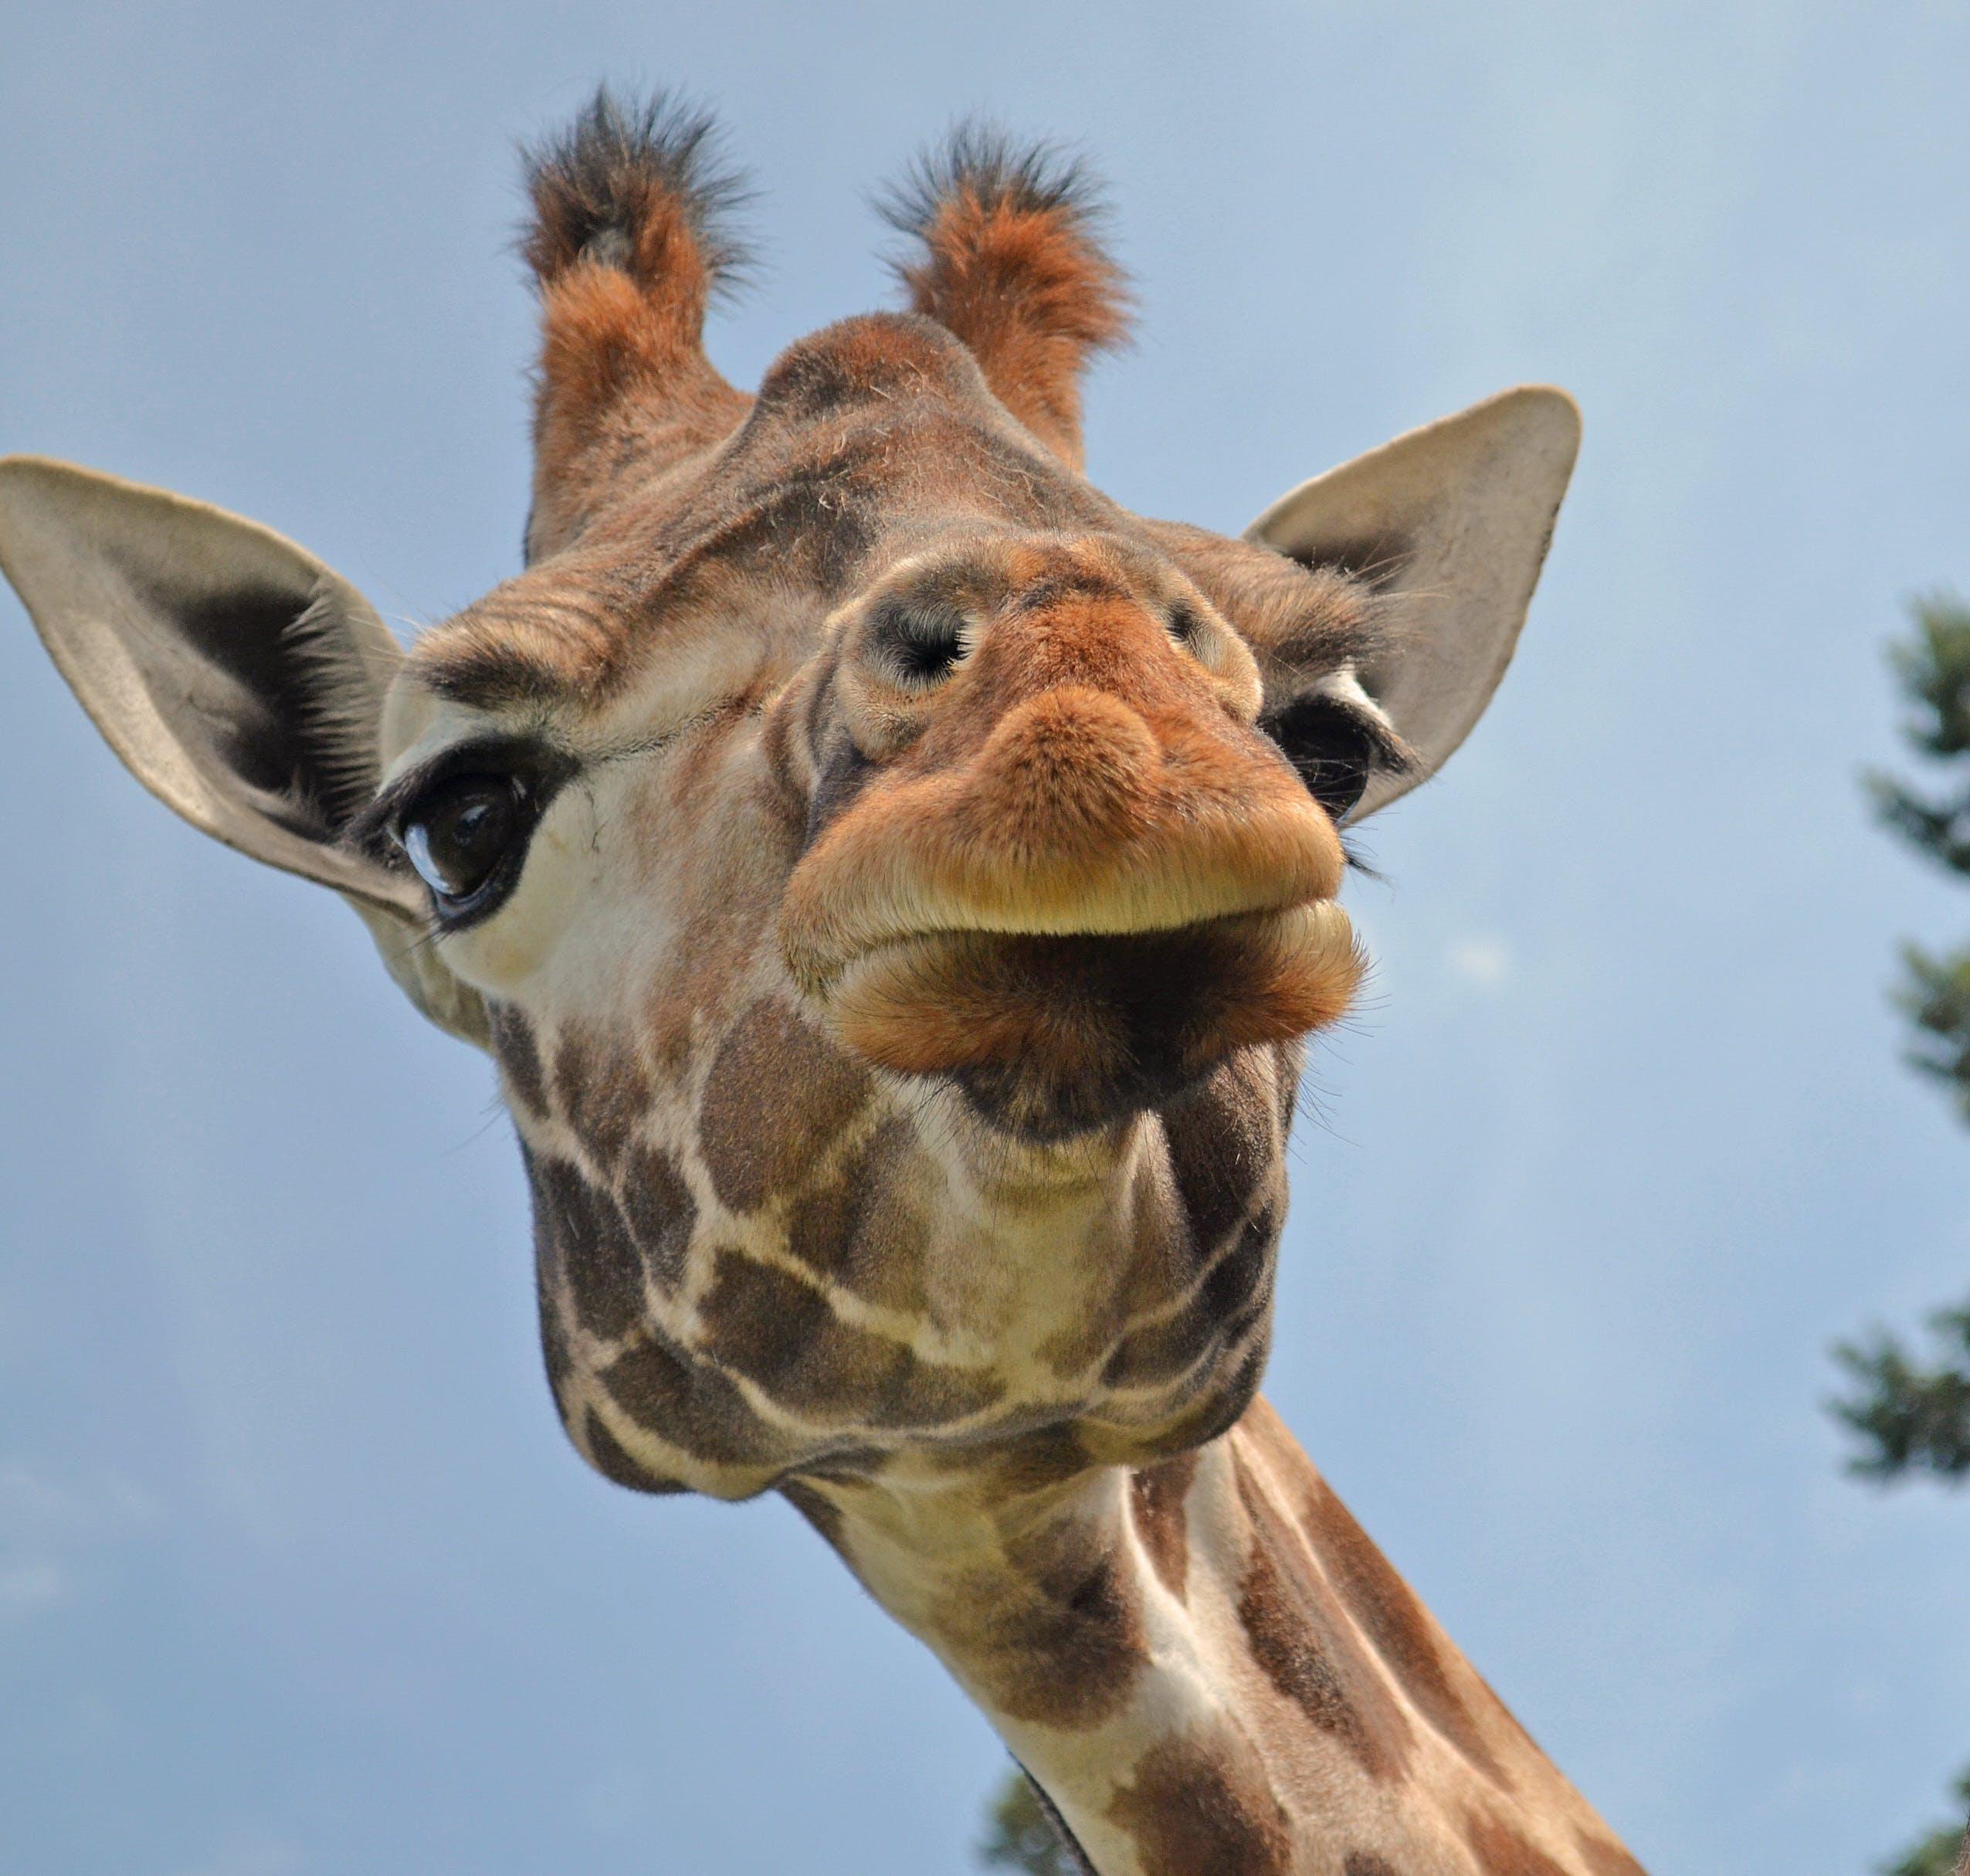 Free stock photo of animals, zoo, giraffe, close